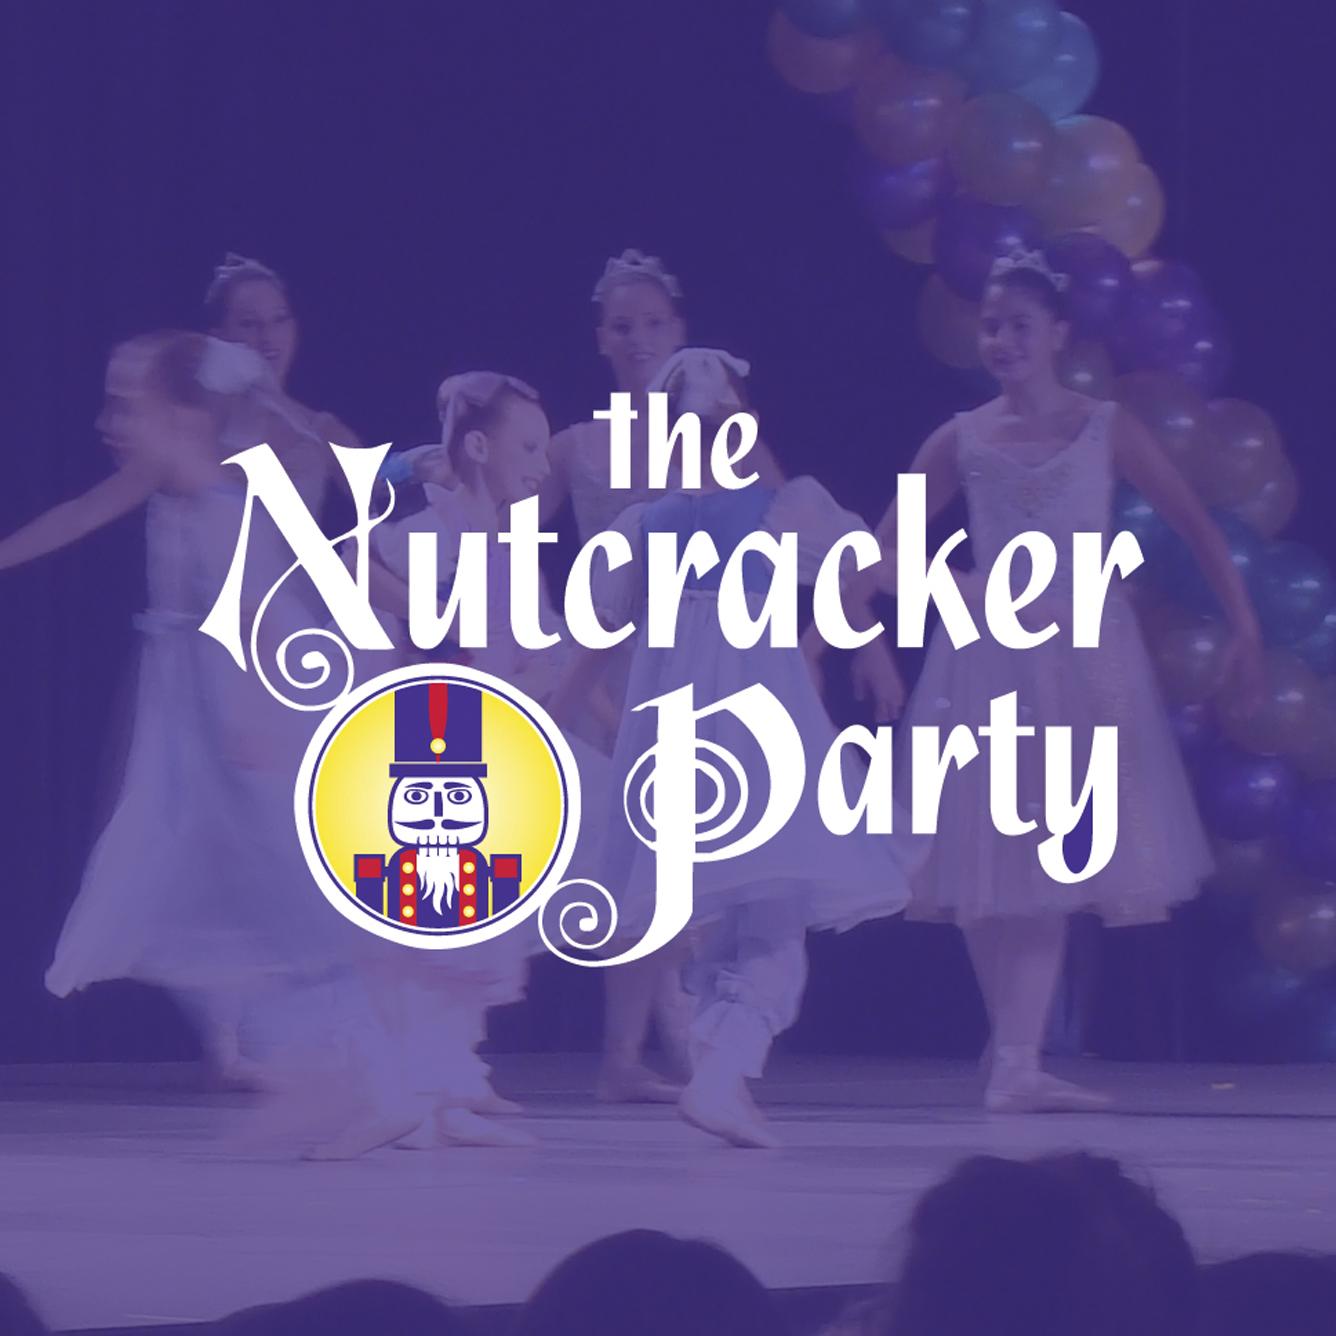 Sommerset Design - Ballet Arizona, The Nutcracker Party